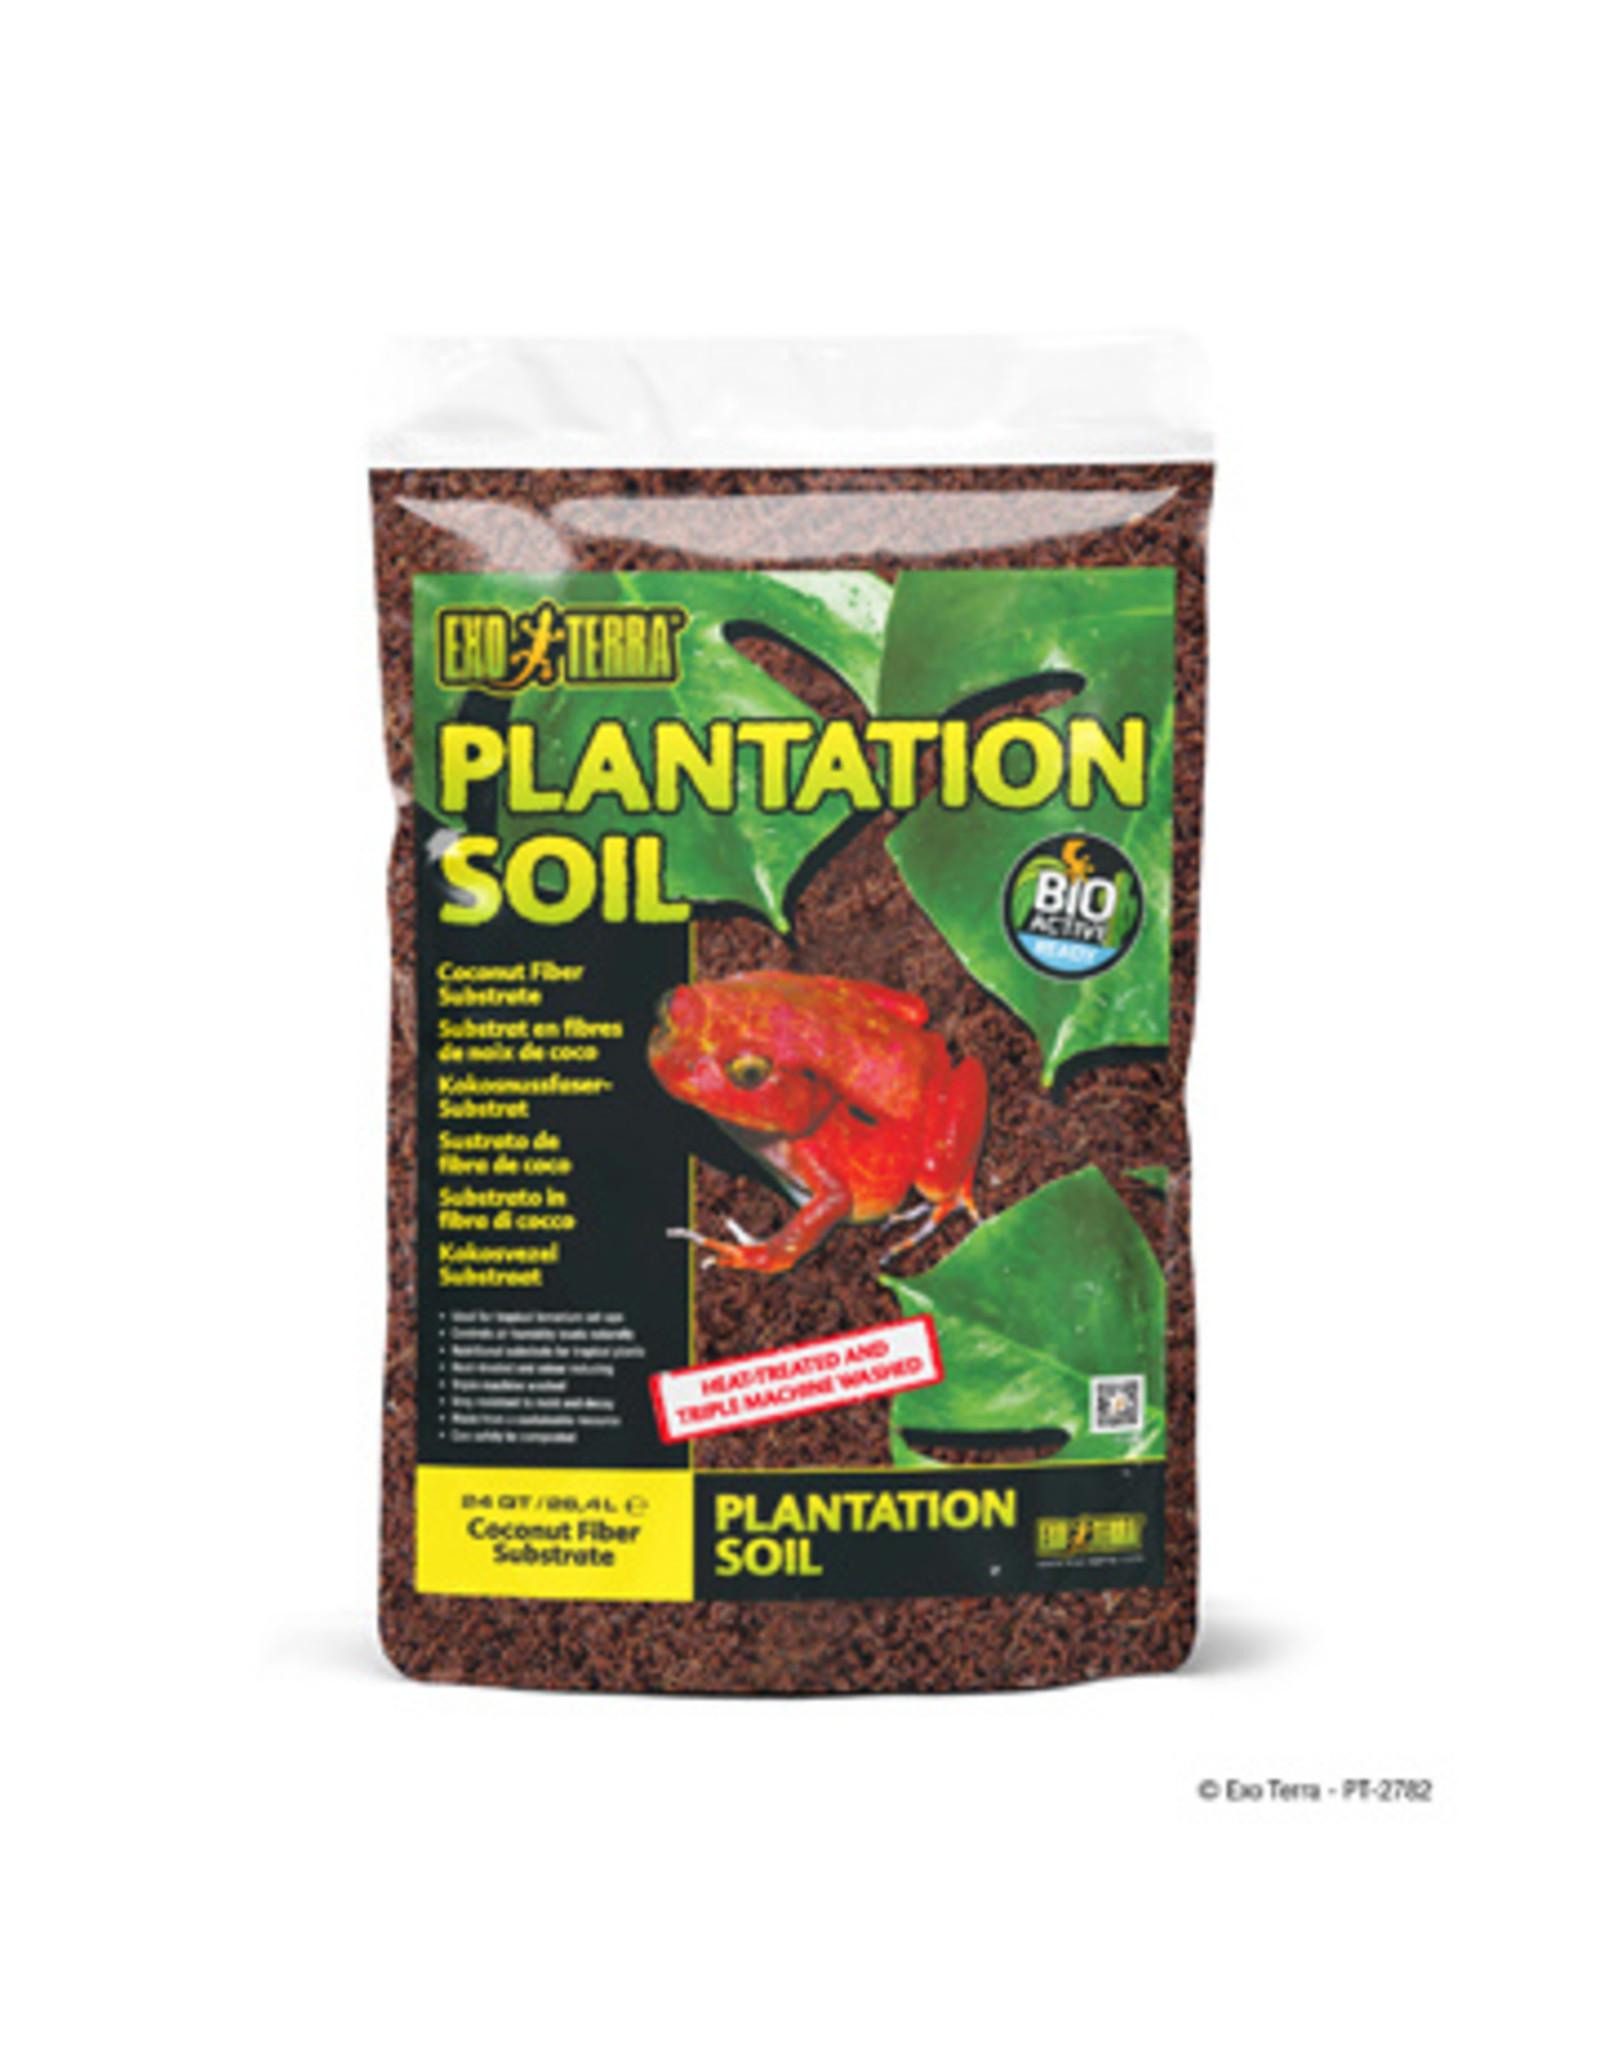 Exo Terra Plantation Soil Substrate 26.4L